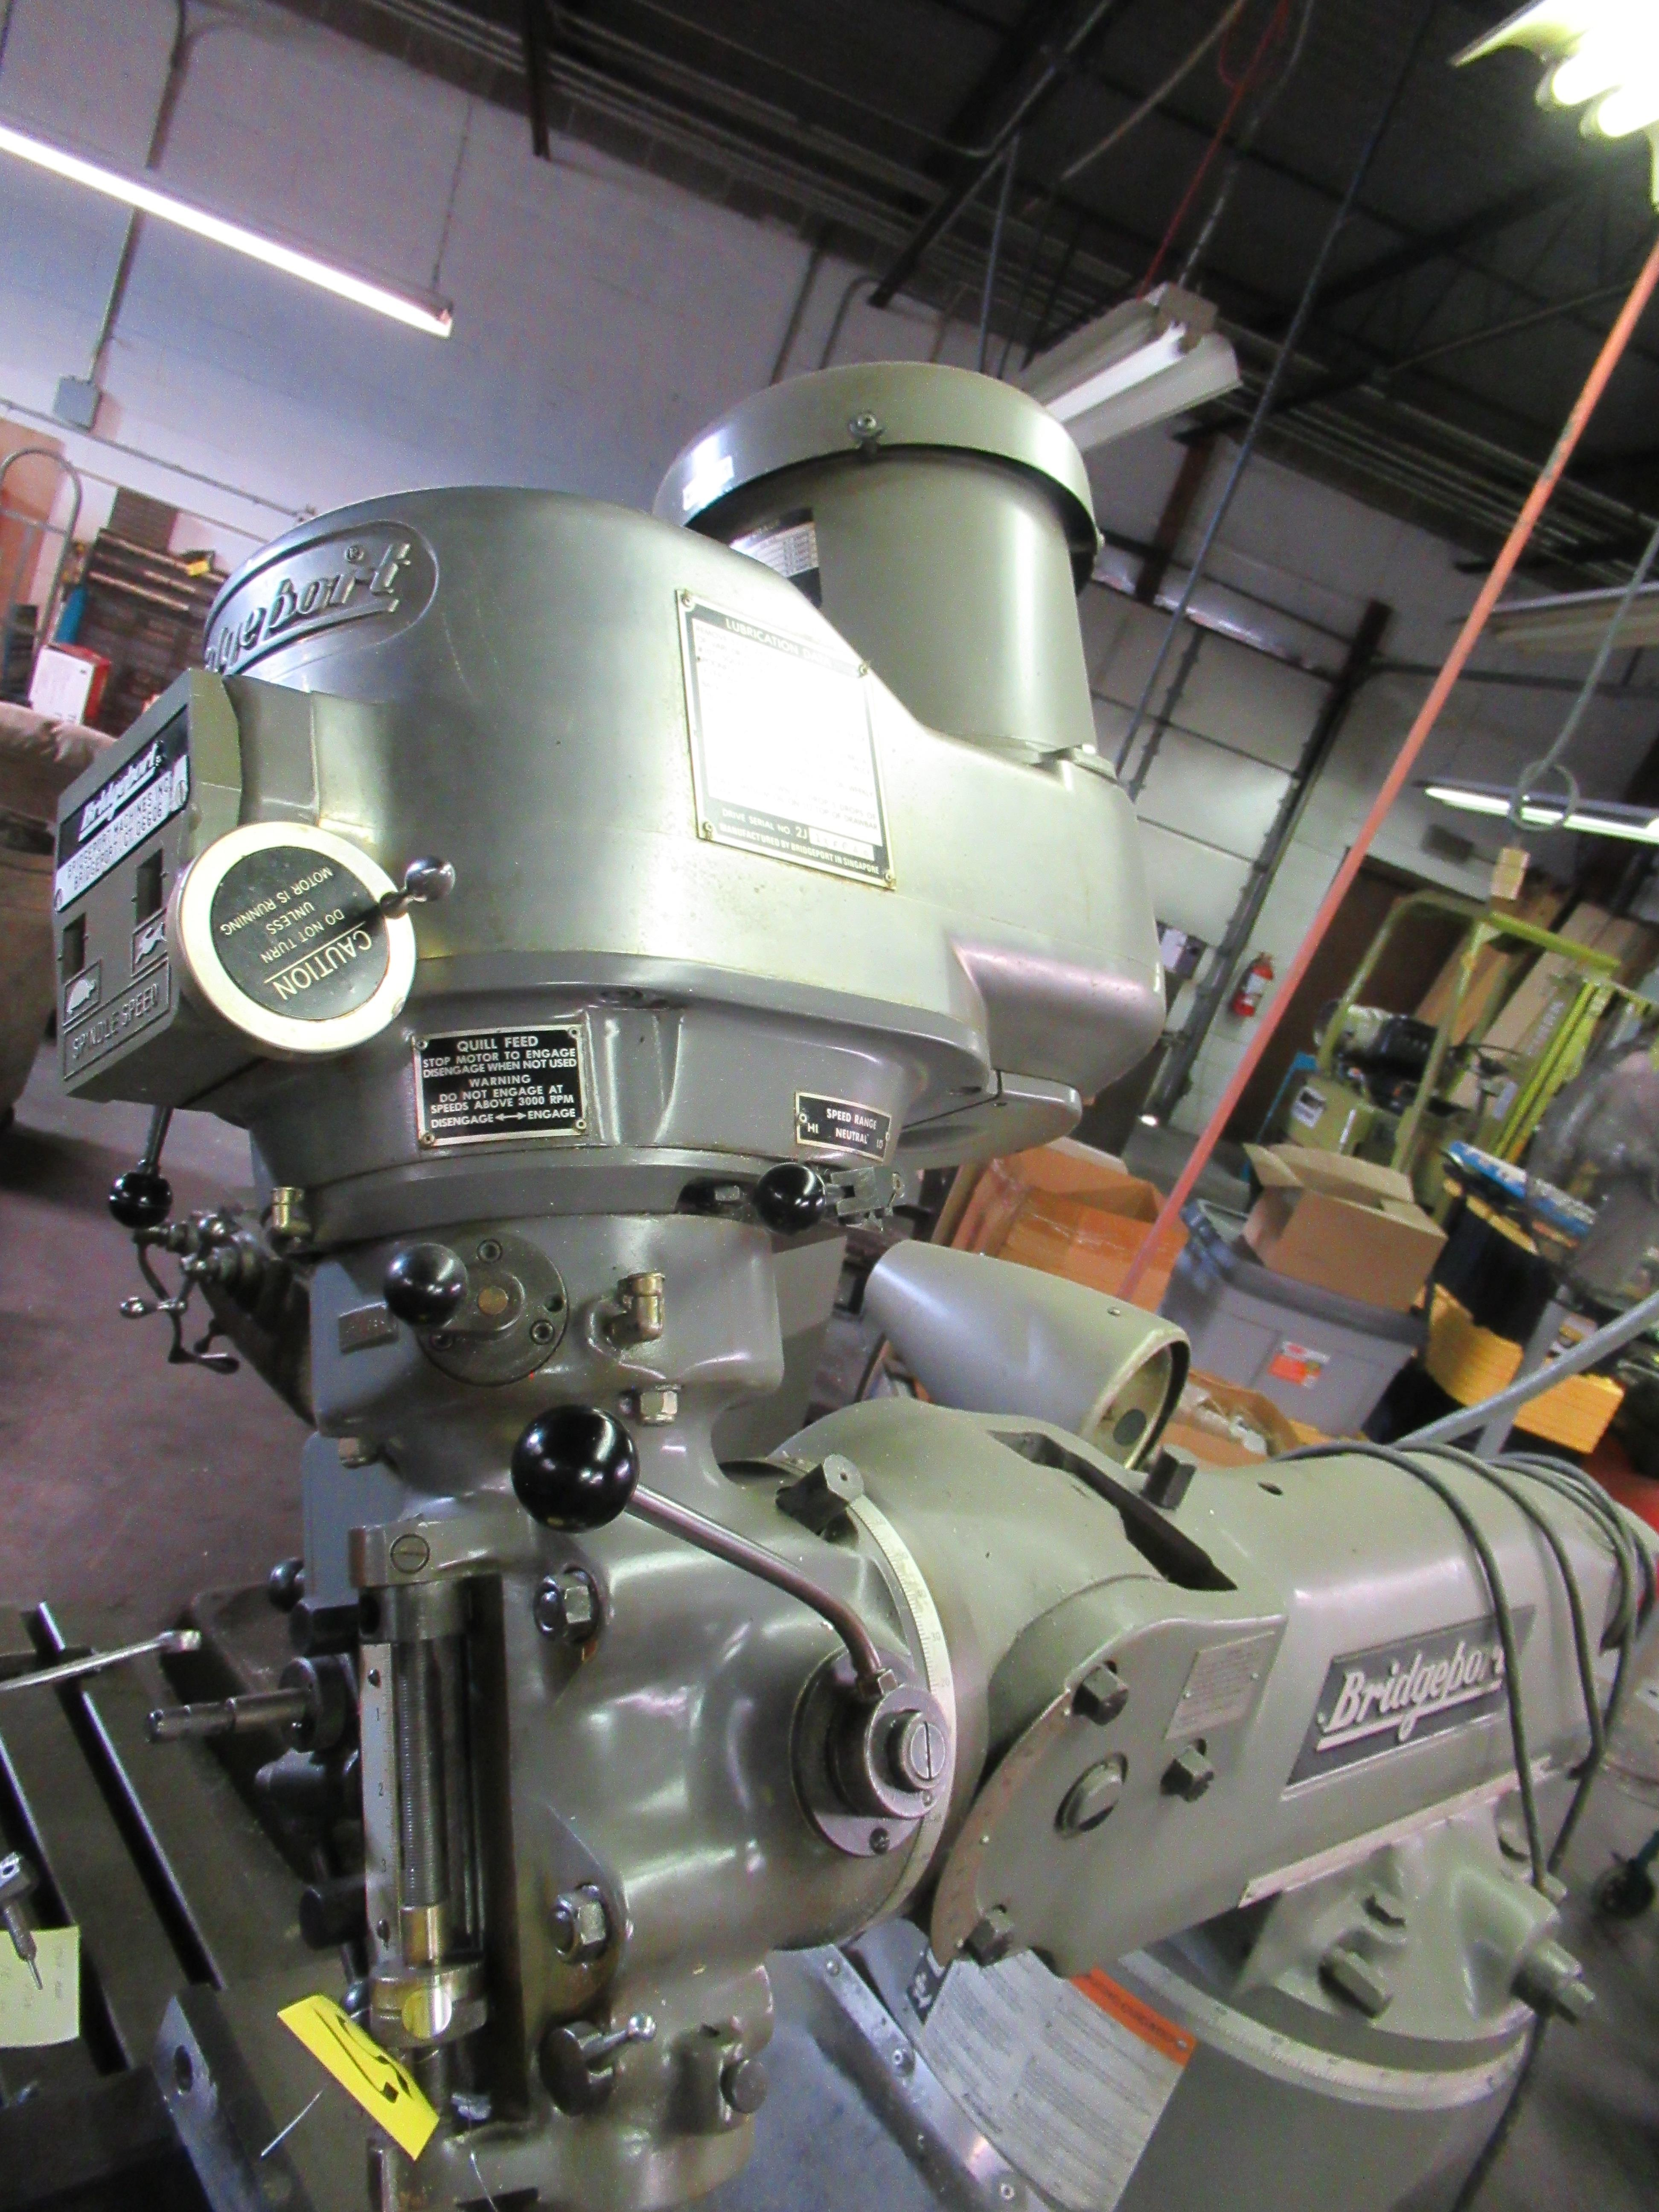 "BRIDGEPORT 2HP VERTICAL MILLING MACHINE, 9"" X 42"" TABLE, 60-4200 RPM, SERVO FEED TABLE, S/N: - Image 8 of 8"